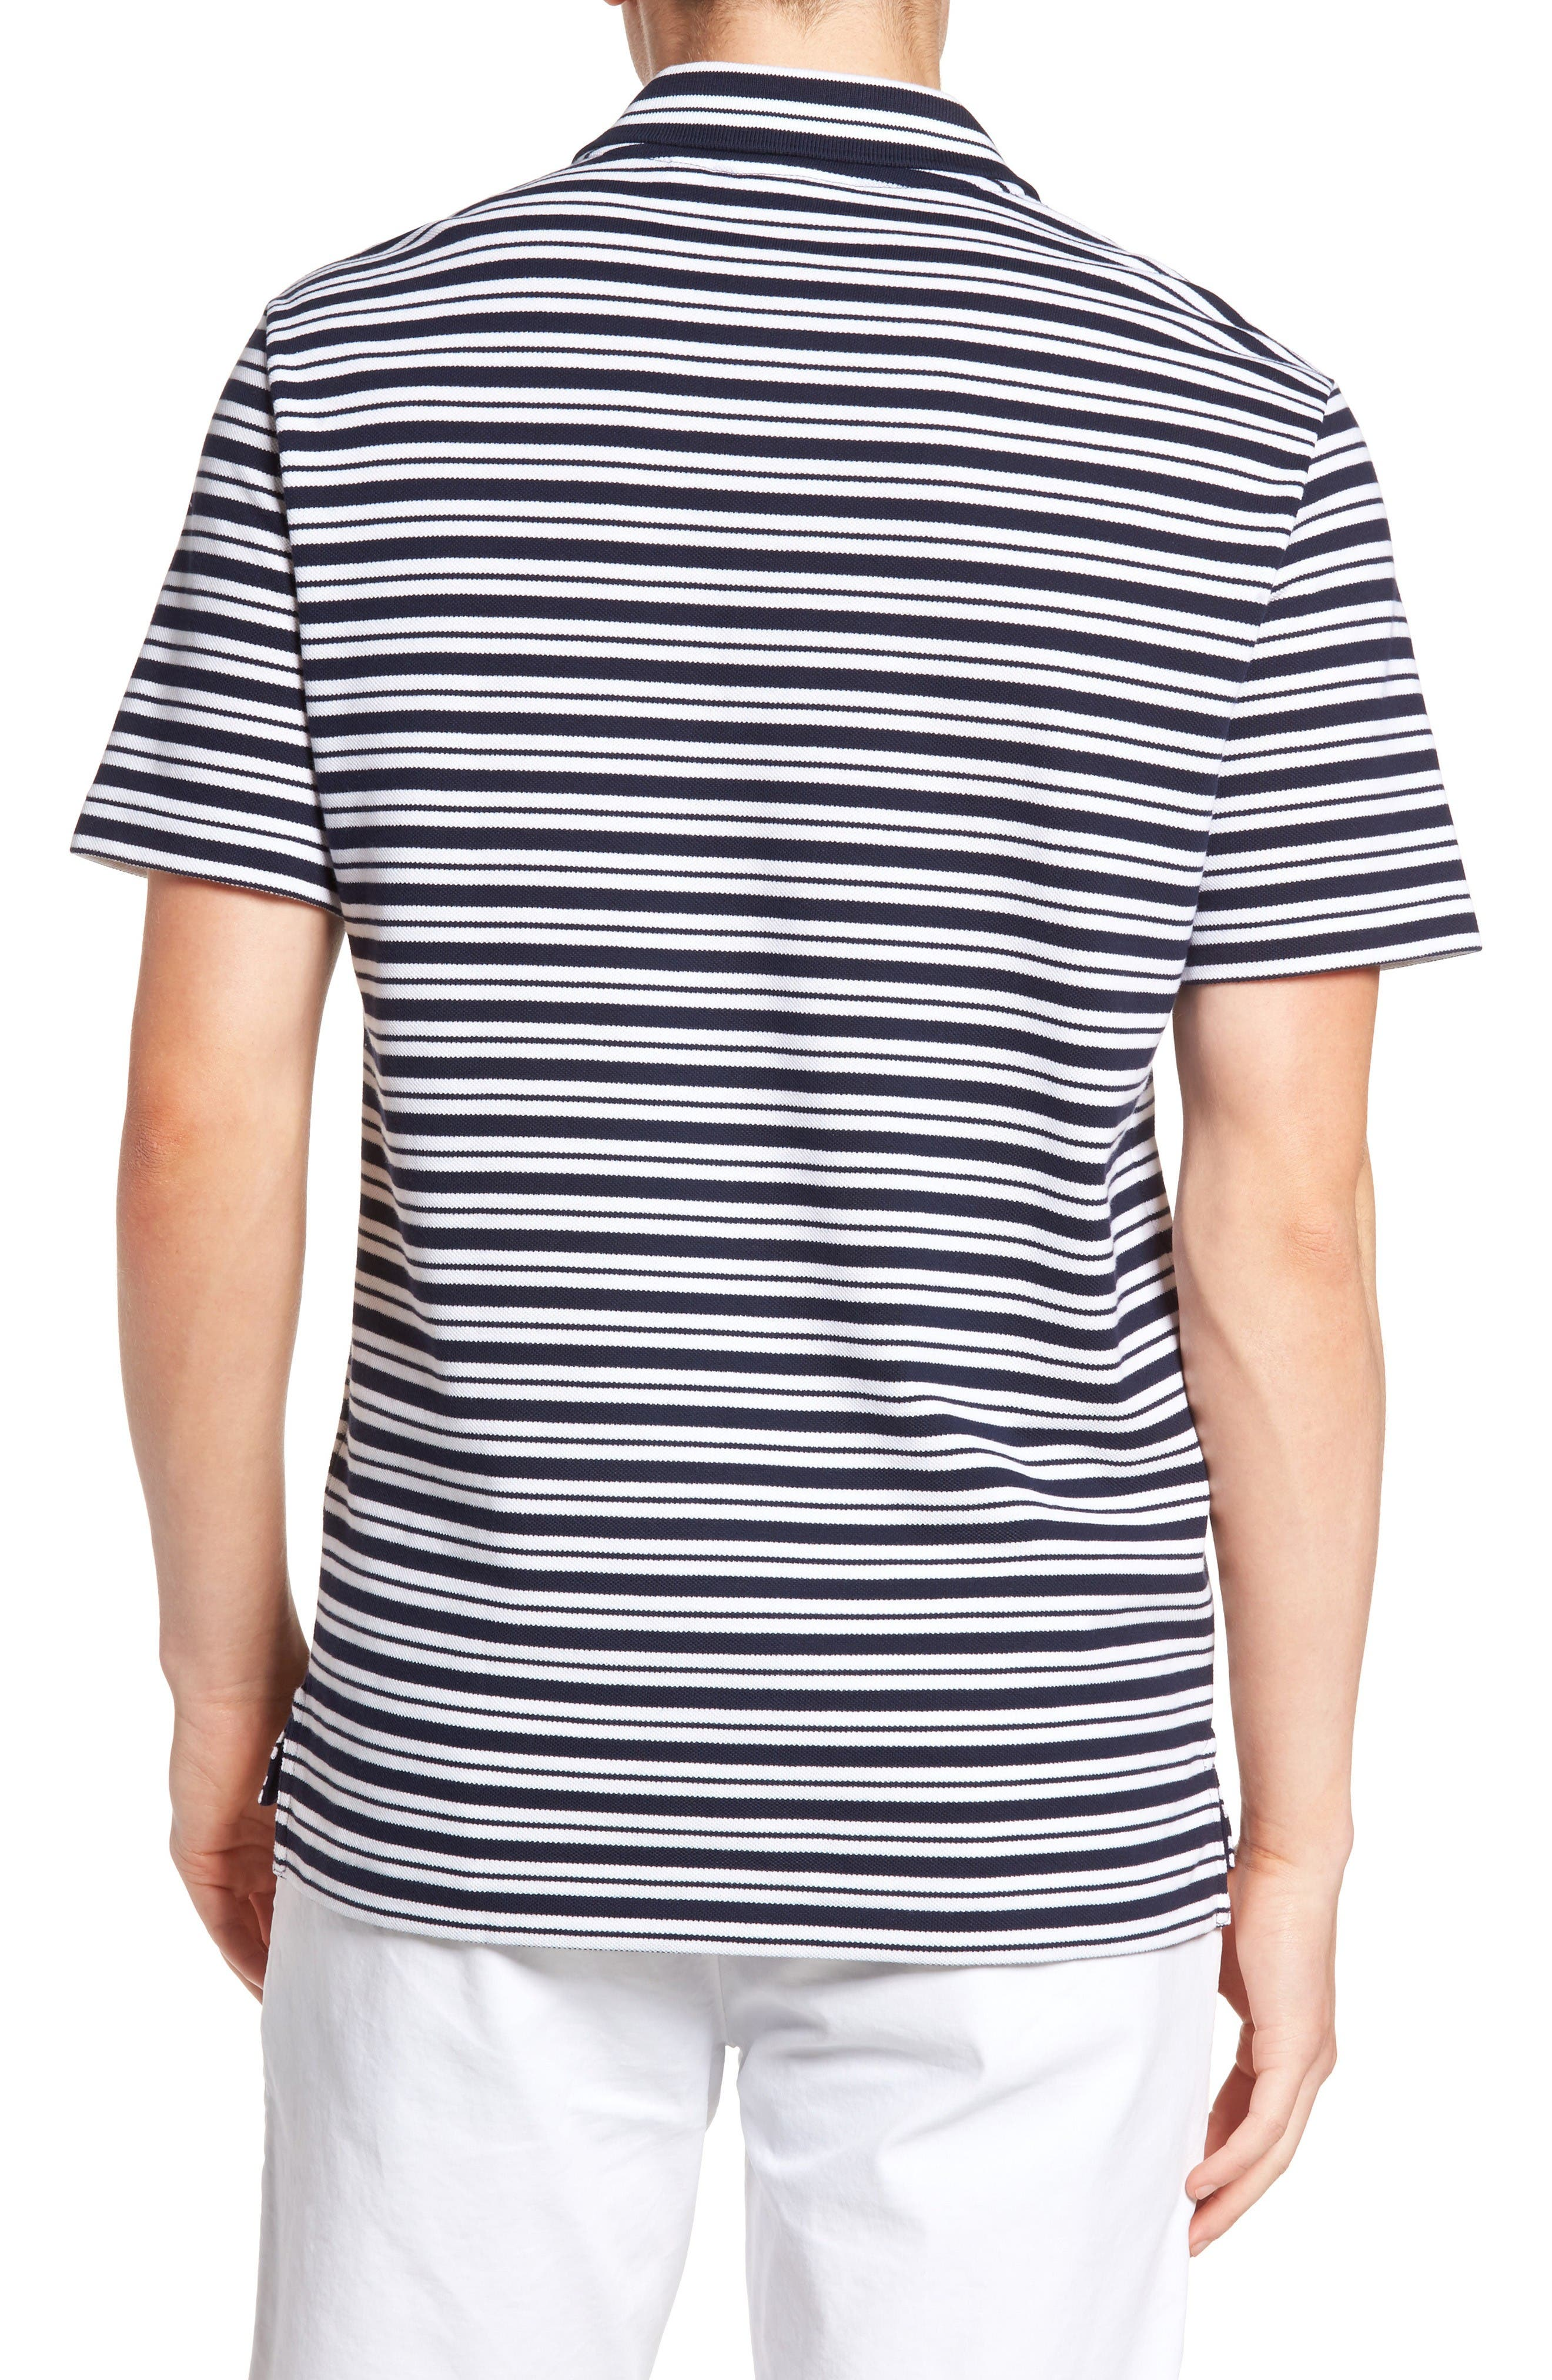 Striped Polo,                             Alternate thumbnail 2, color,                             Navy Blue/ White